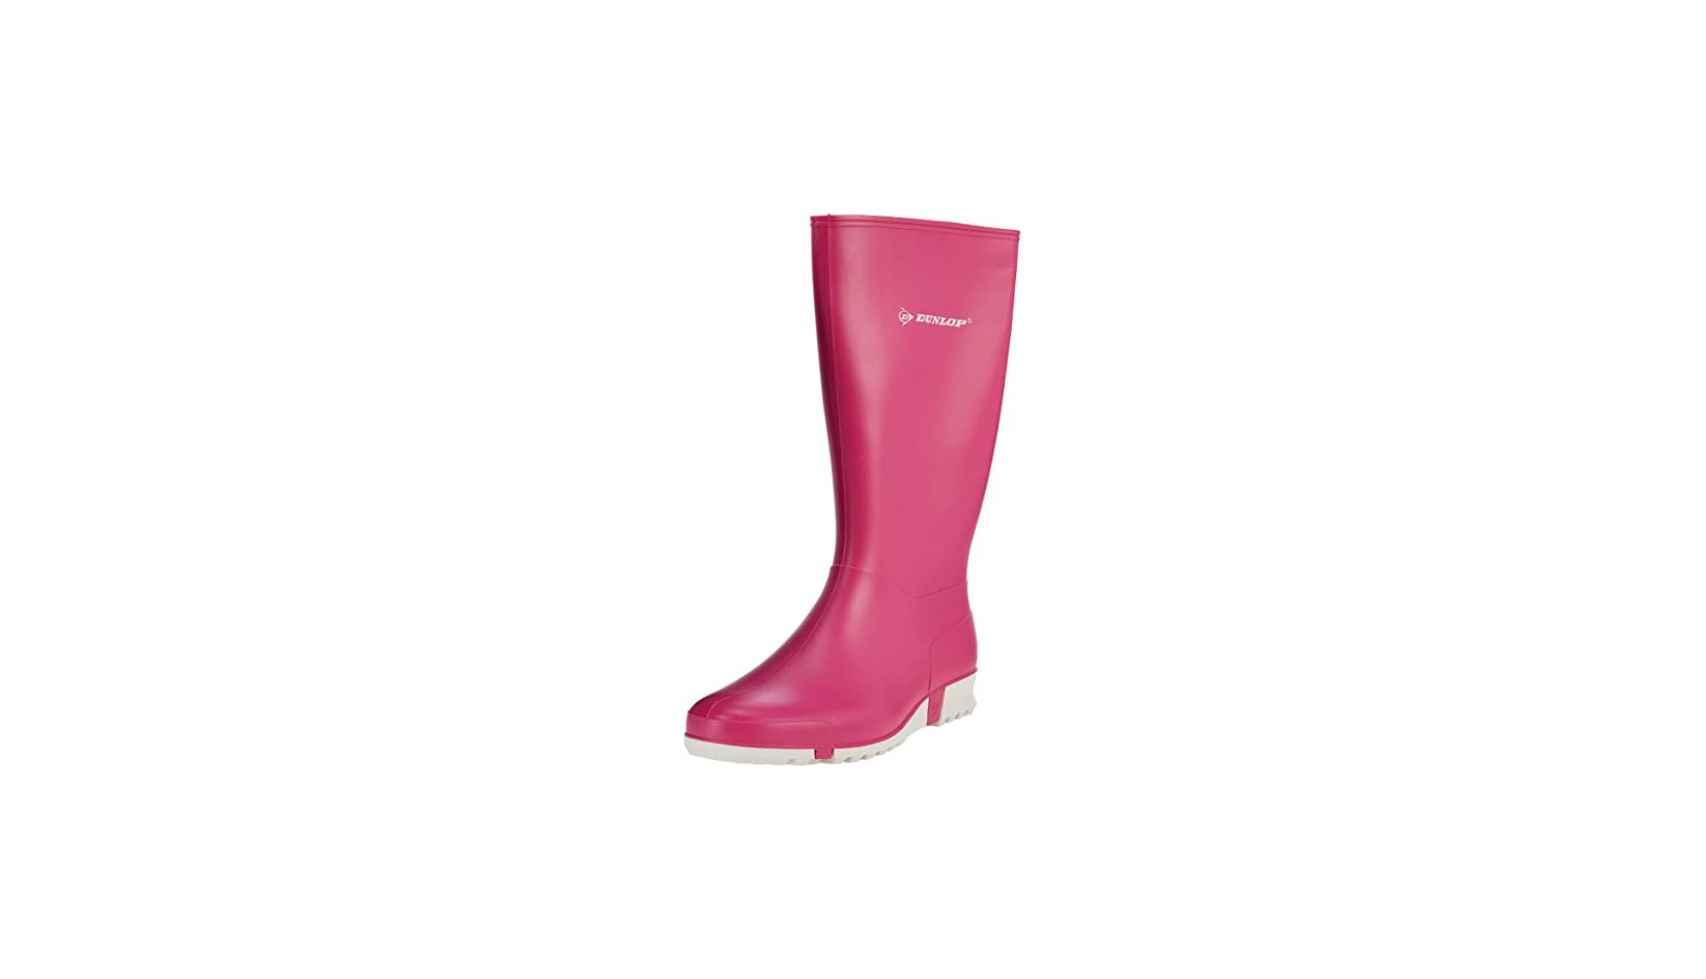 Dunlop Protective Footwear